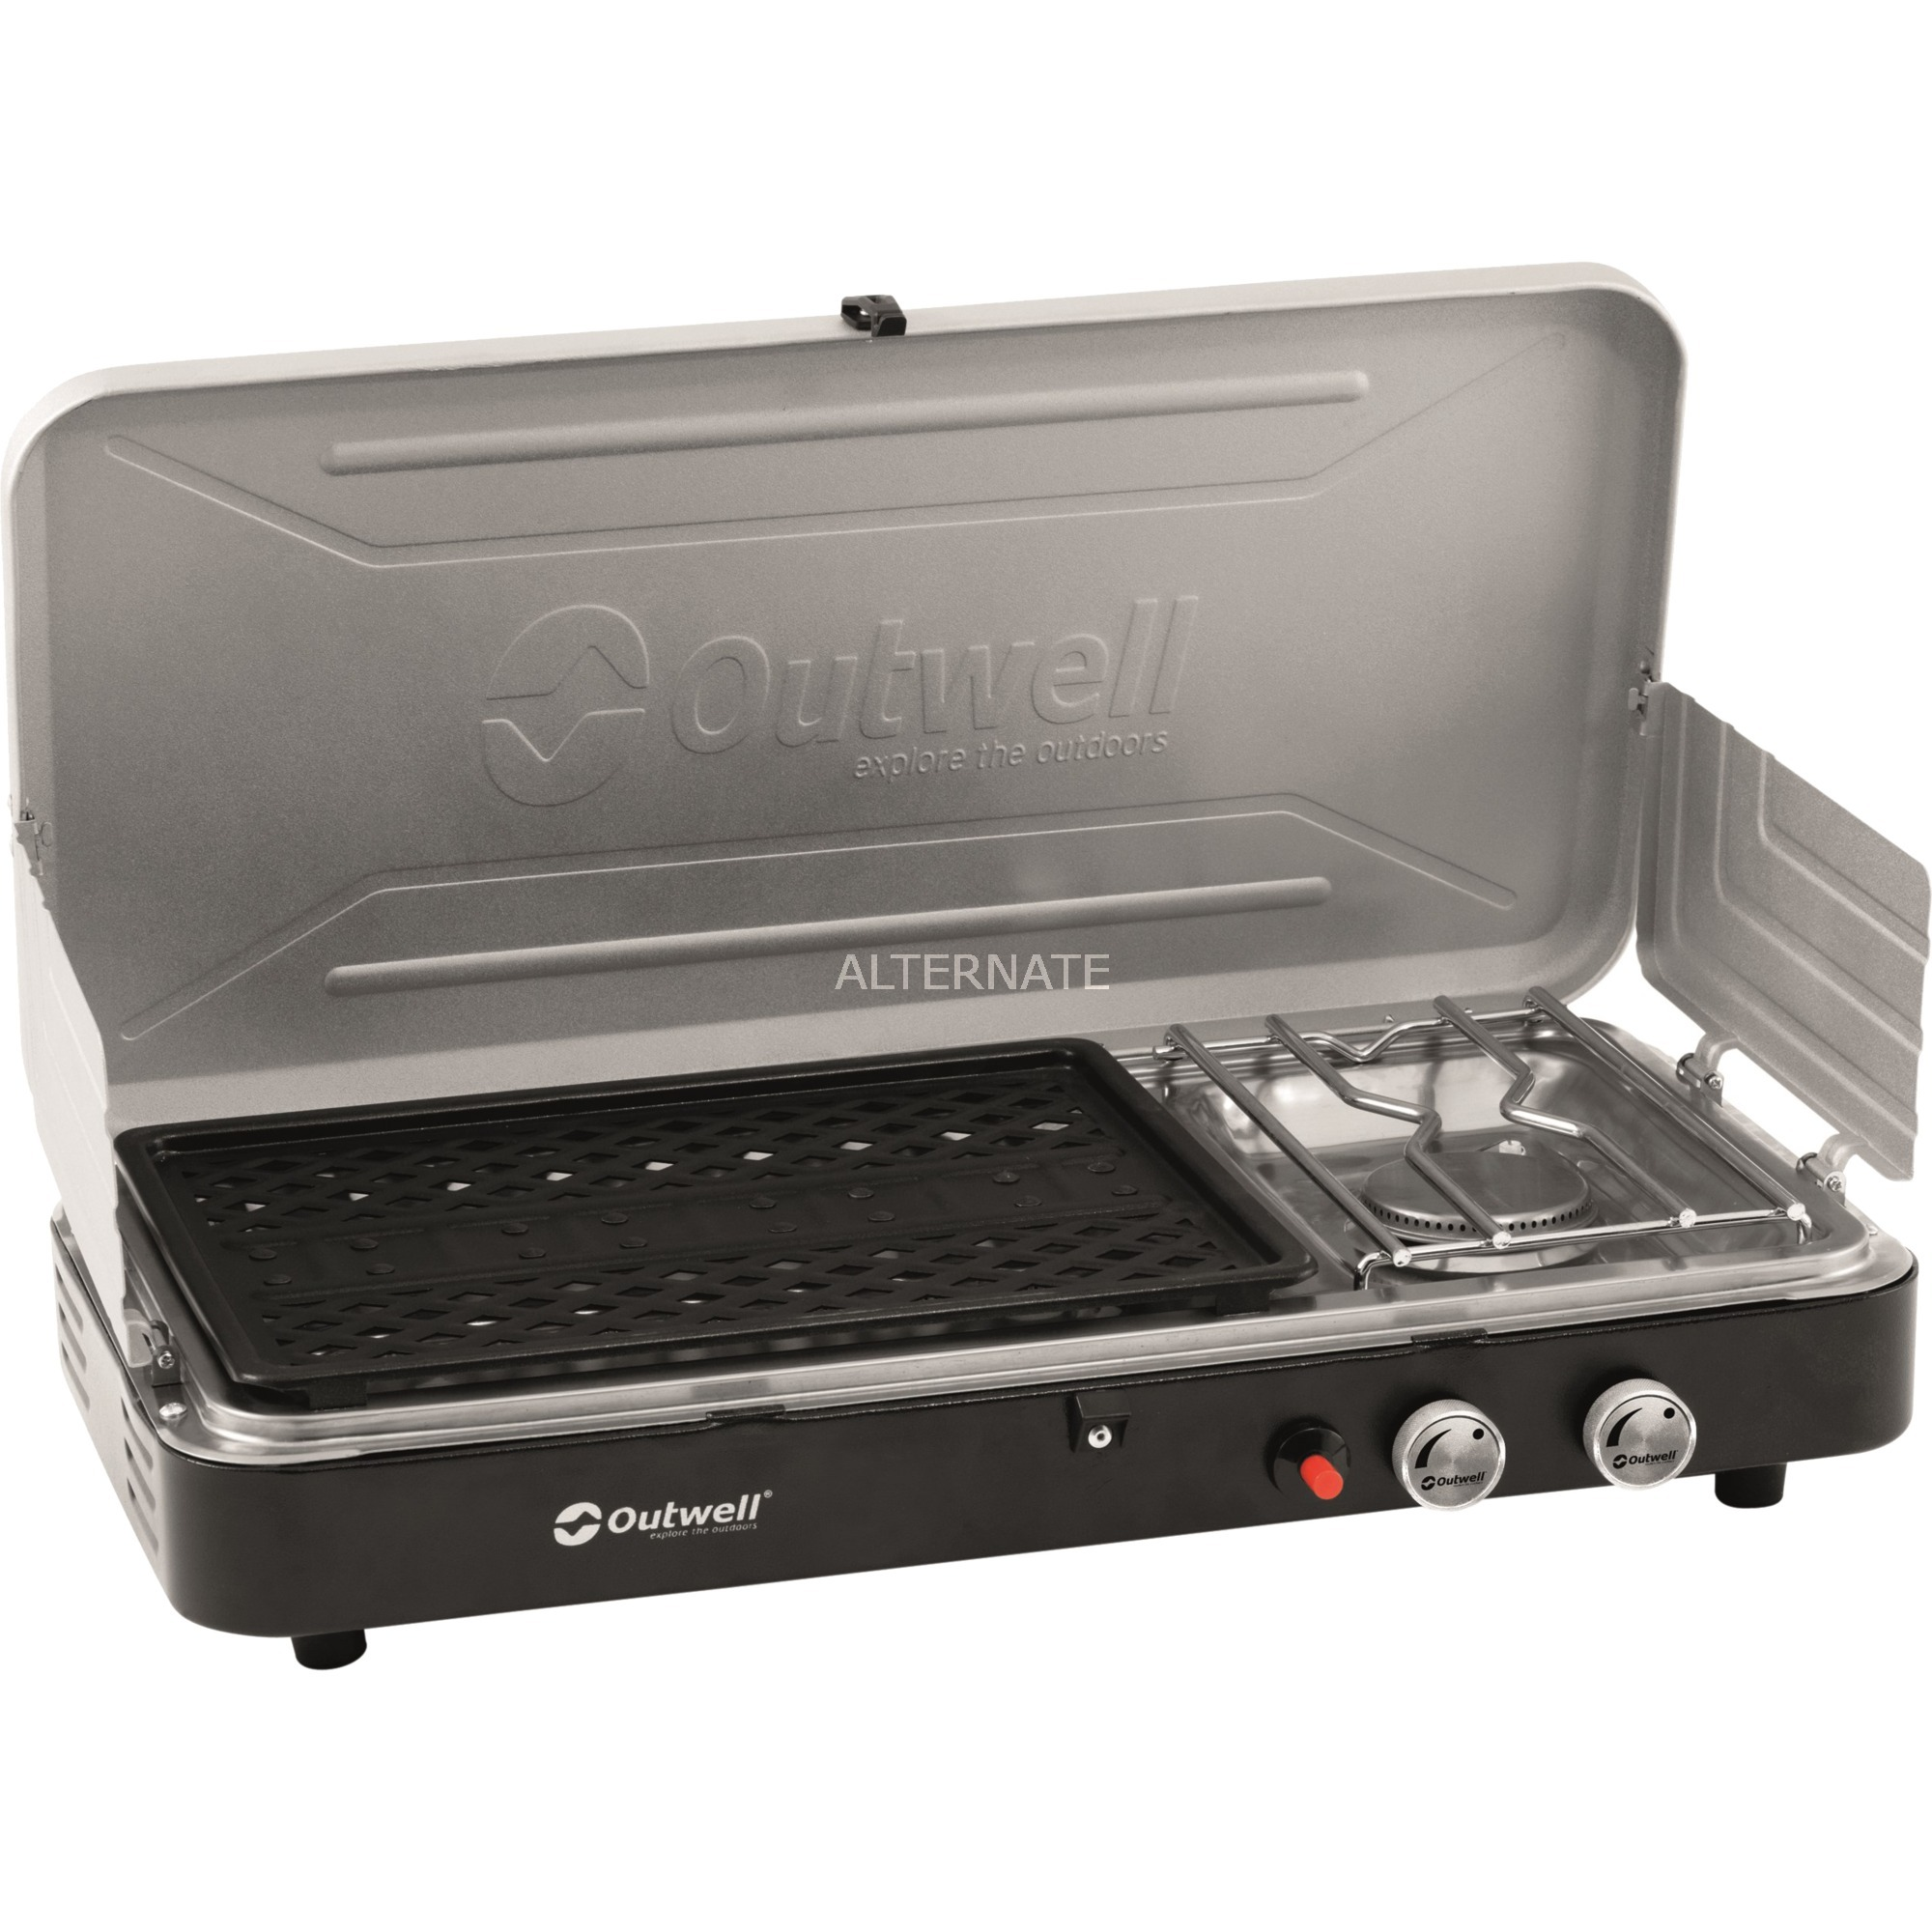 650257e no categorizado, Cocina de gas